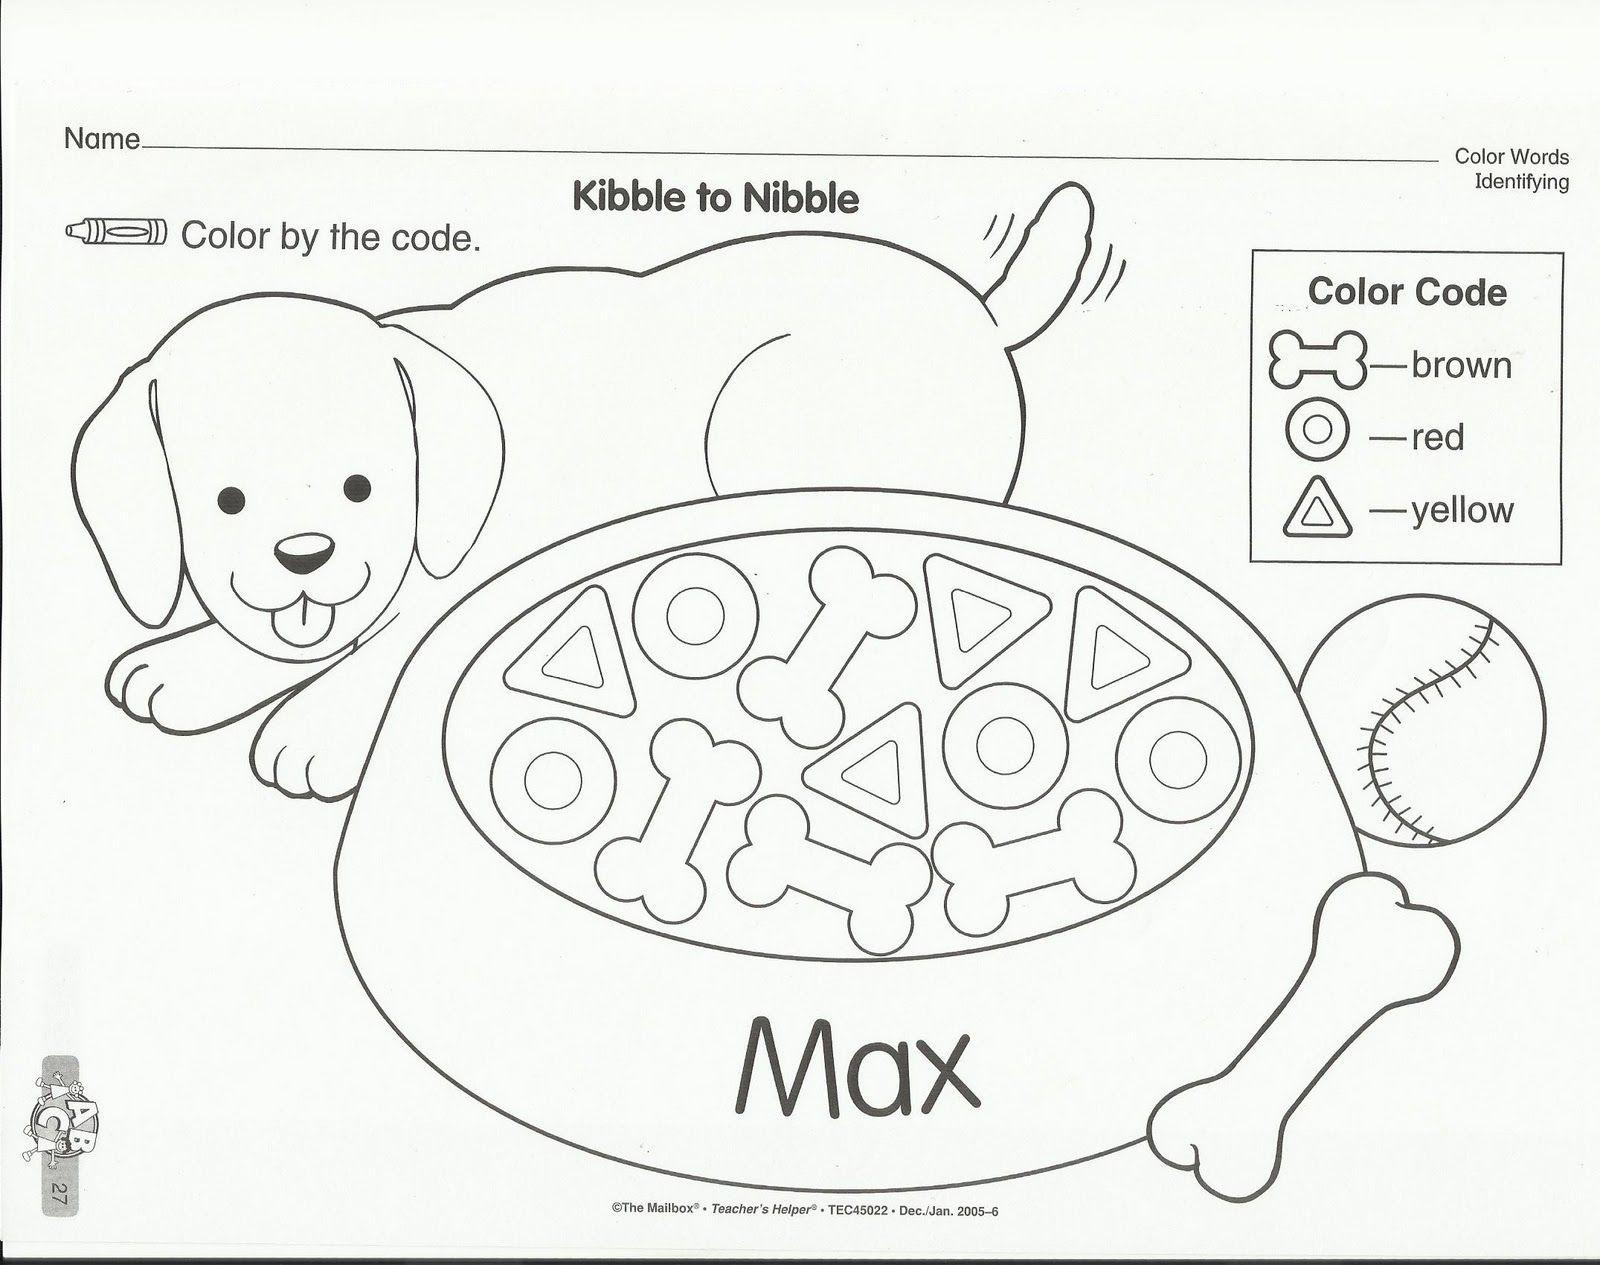 Dogcolordogdish Jpg 1 600 1 265 Pixels Pets Preschool Pets Preschool Theme Preschool Pet Week